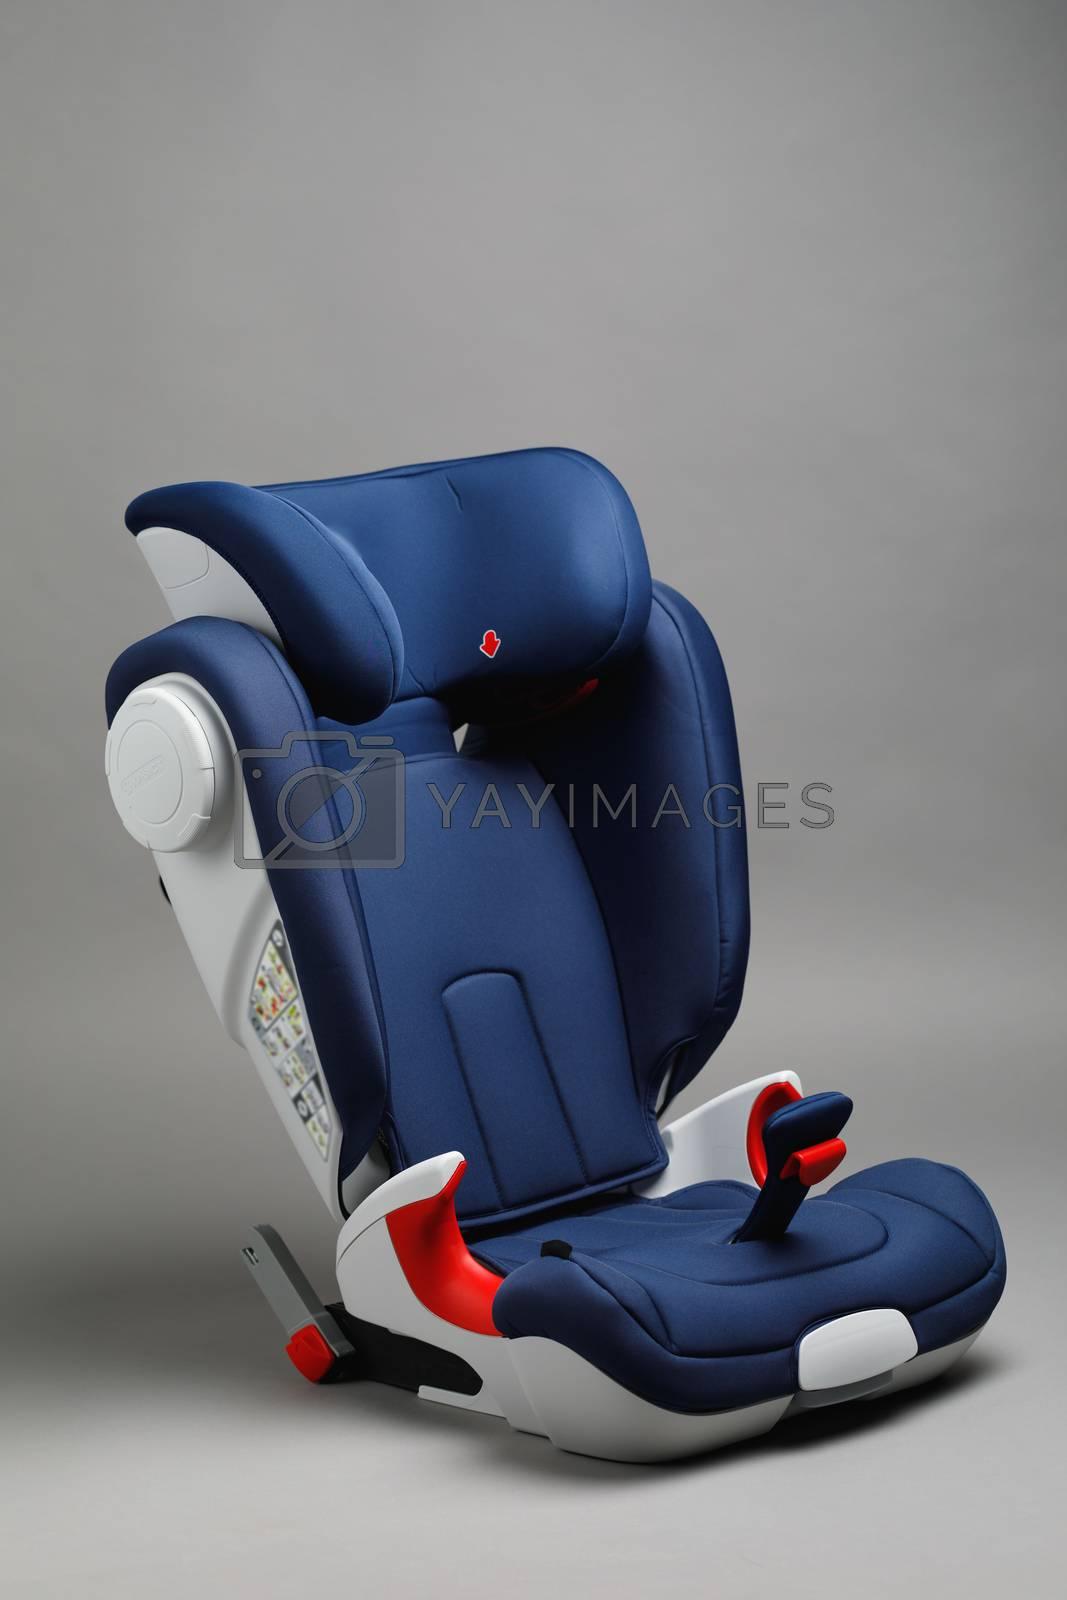 toddler car seat, gray background